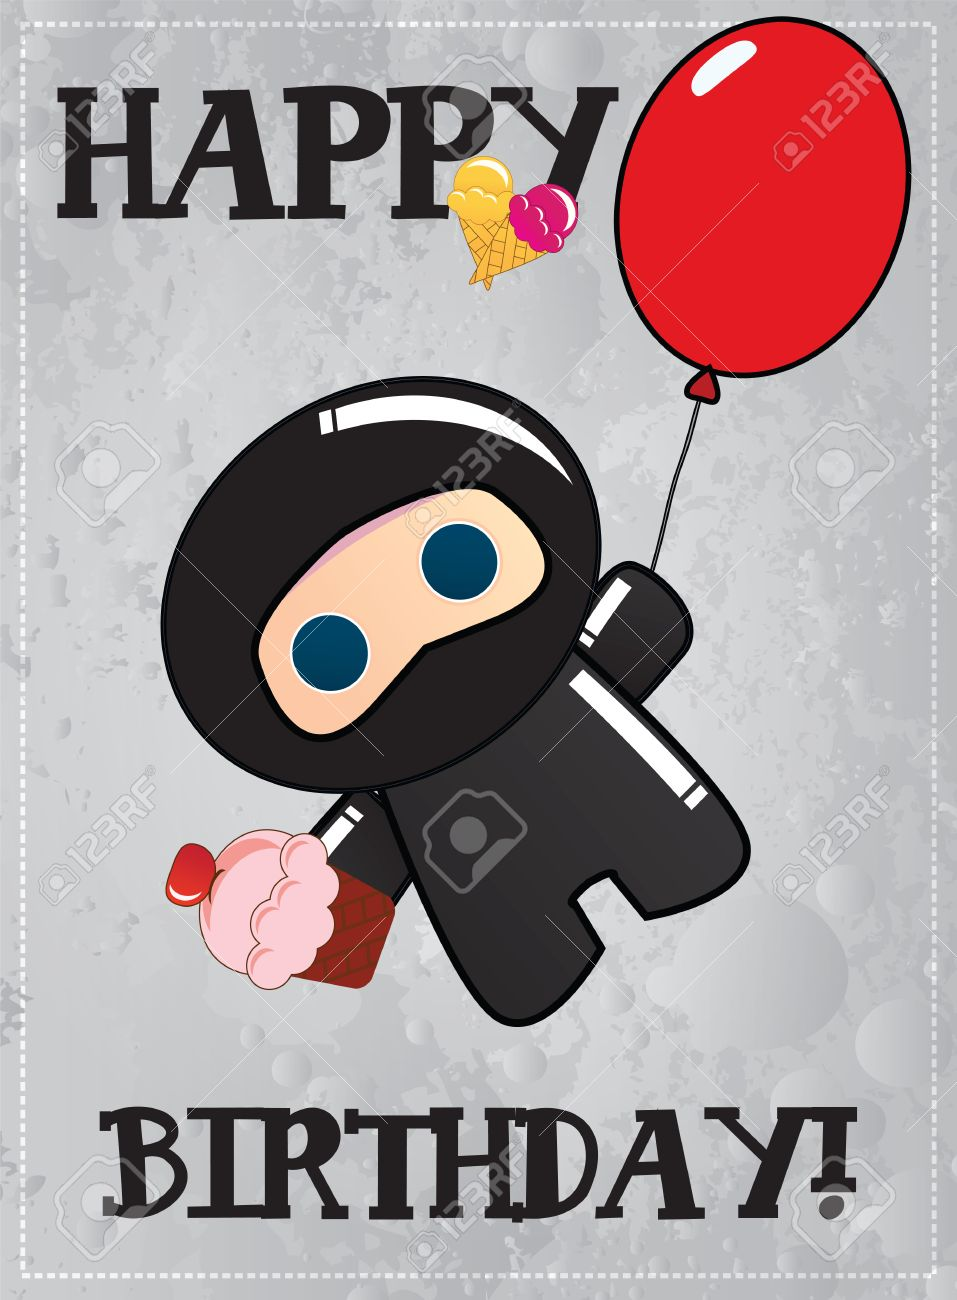 Happy Birthday Card With Cute Cartoon Ninja Character Vector Stock